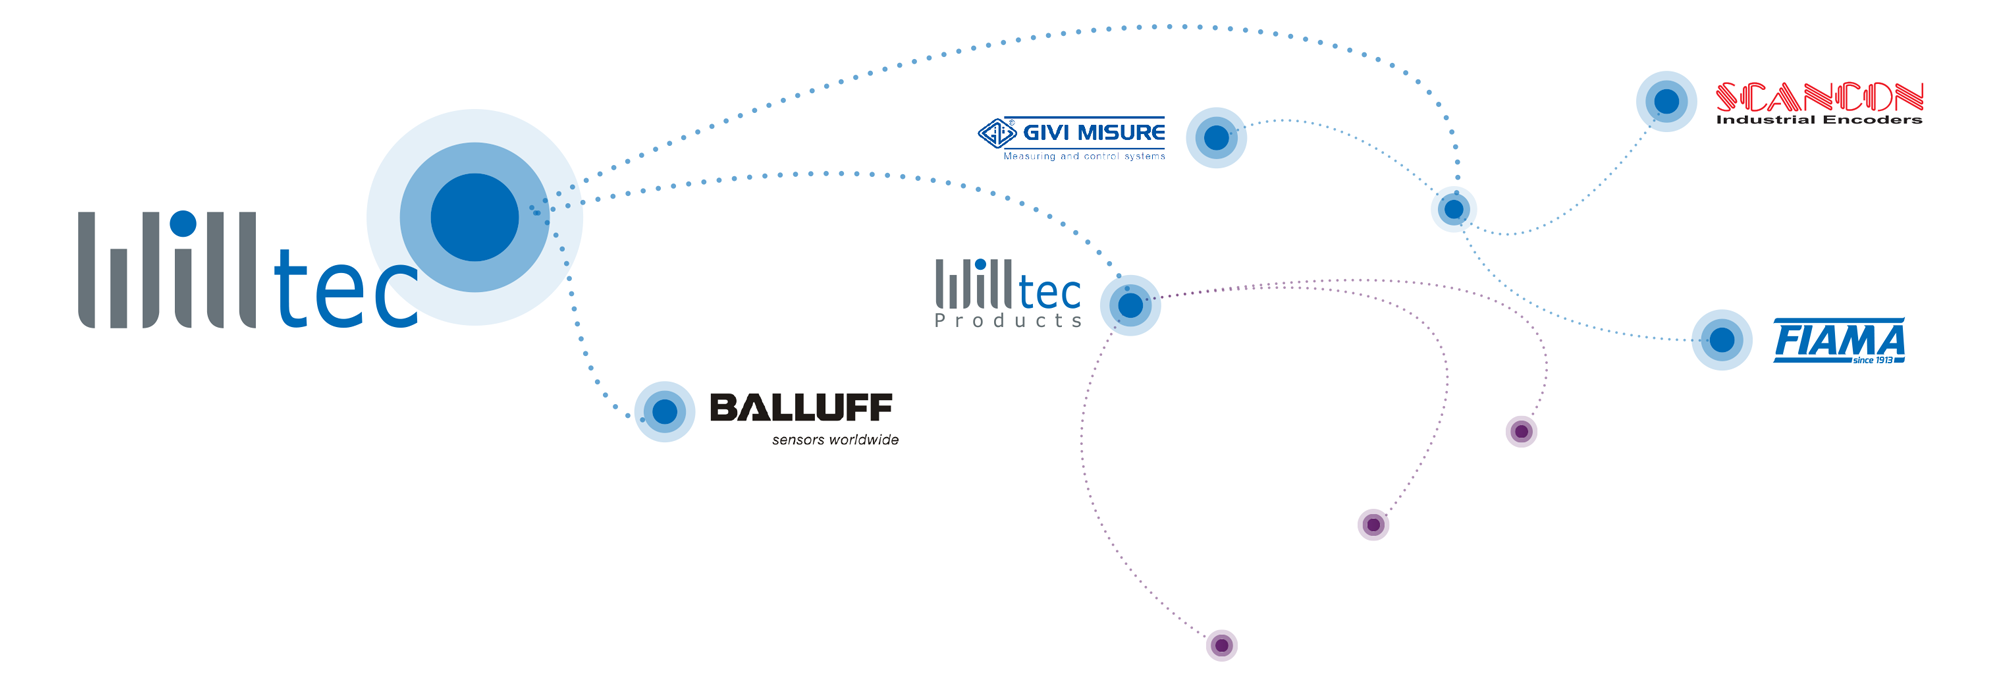 We Represent Precise Measurement Willtec Measuring Technologies Balluff Wiring Diagram Our Partners